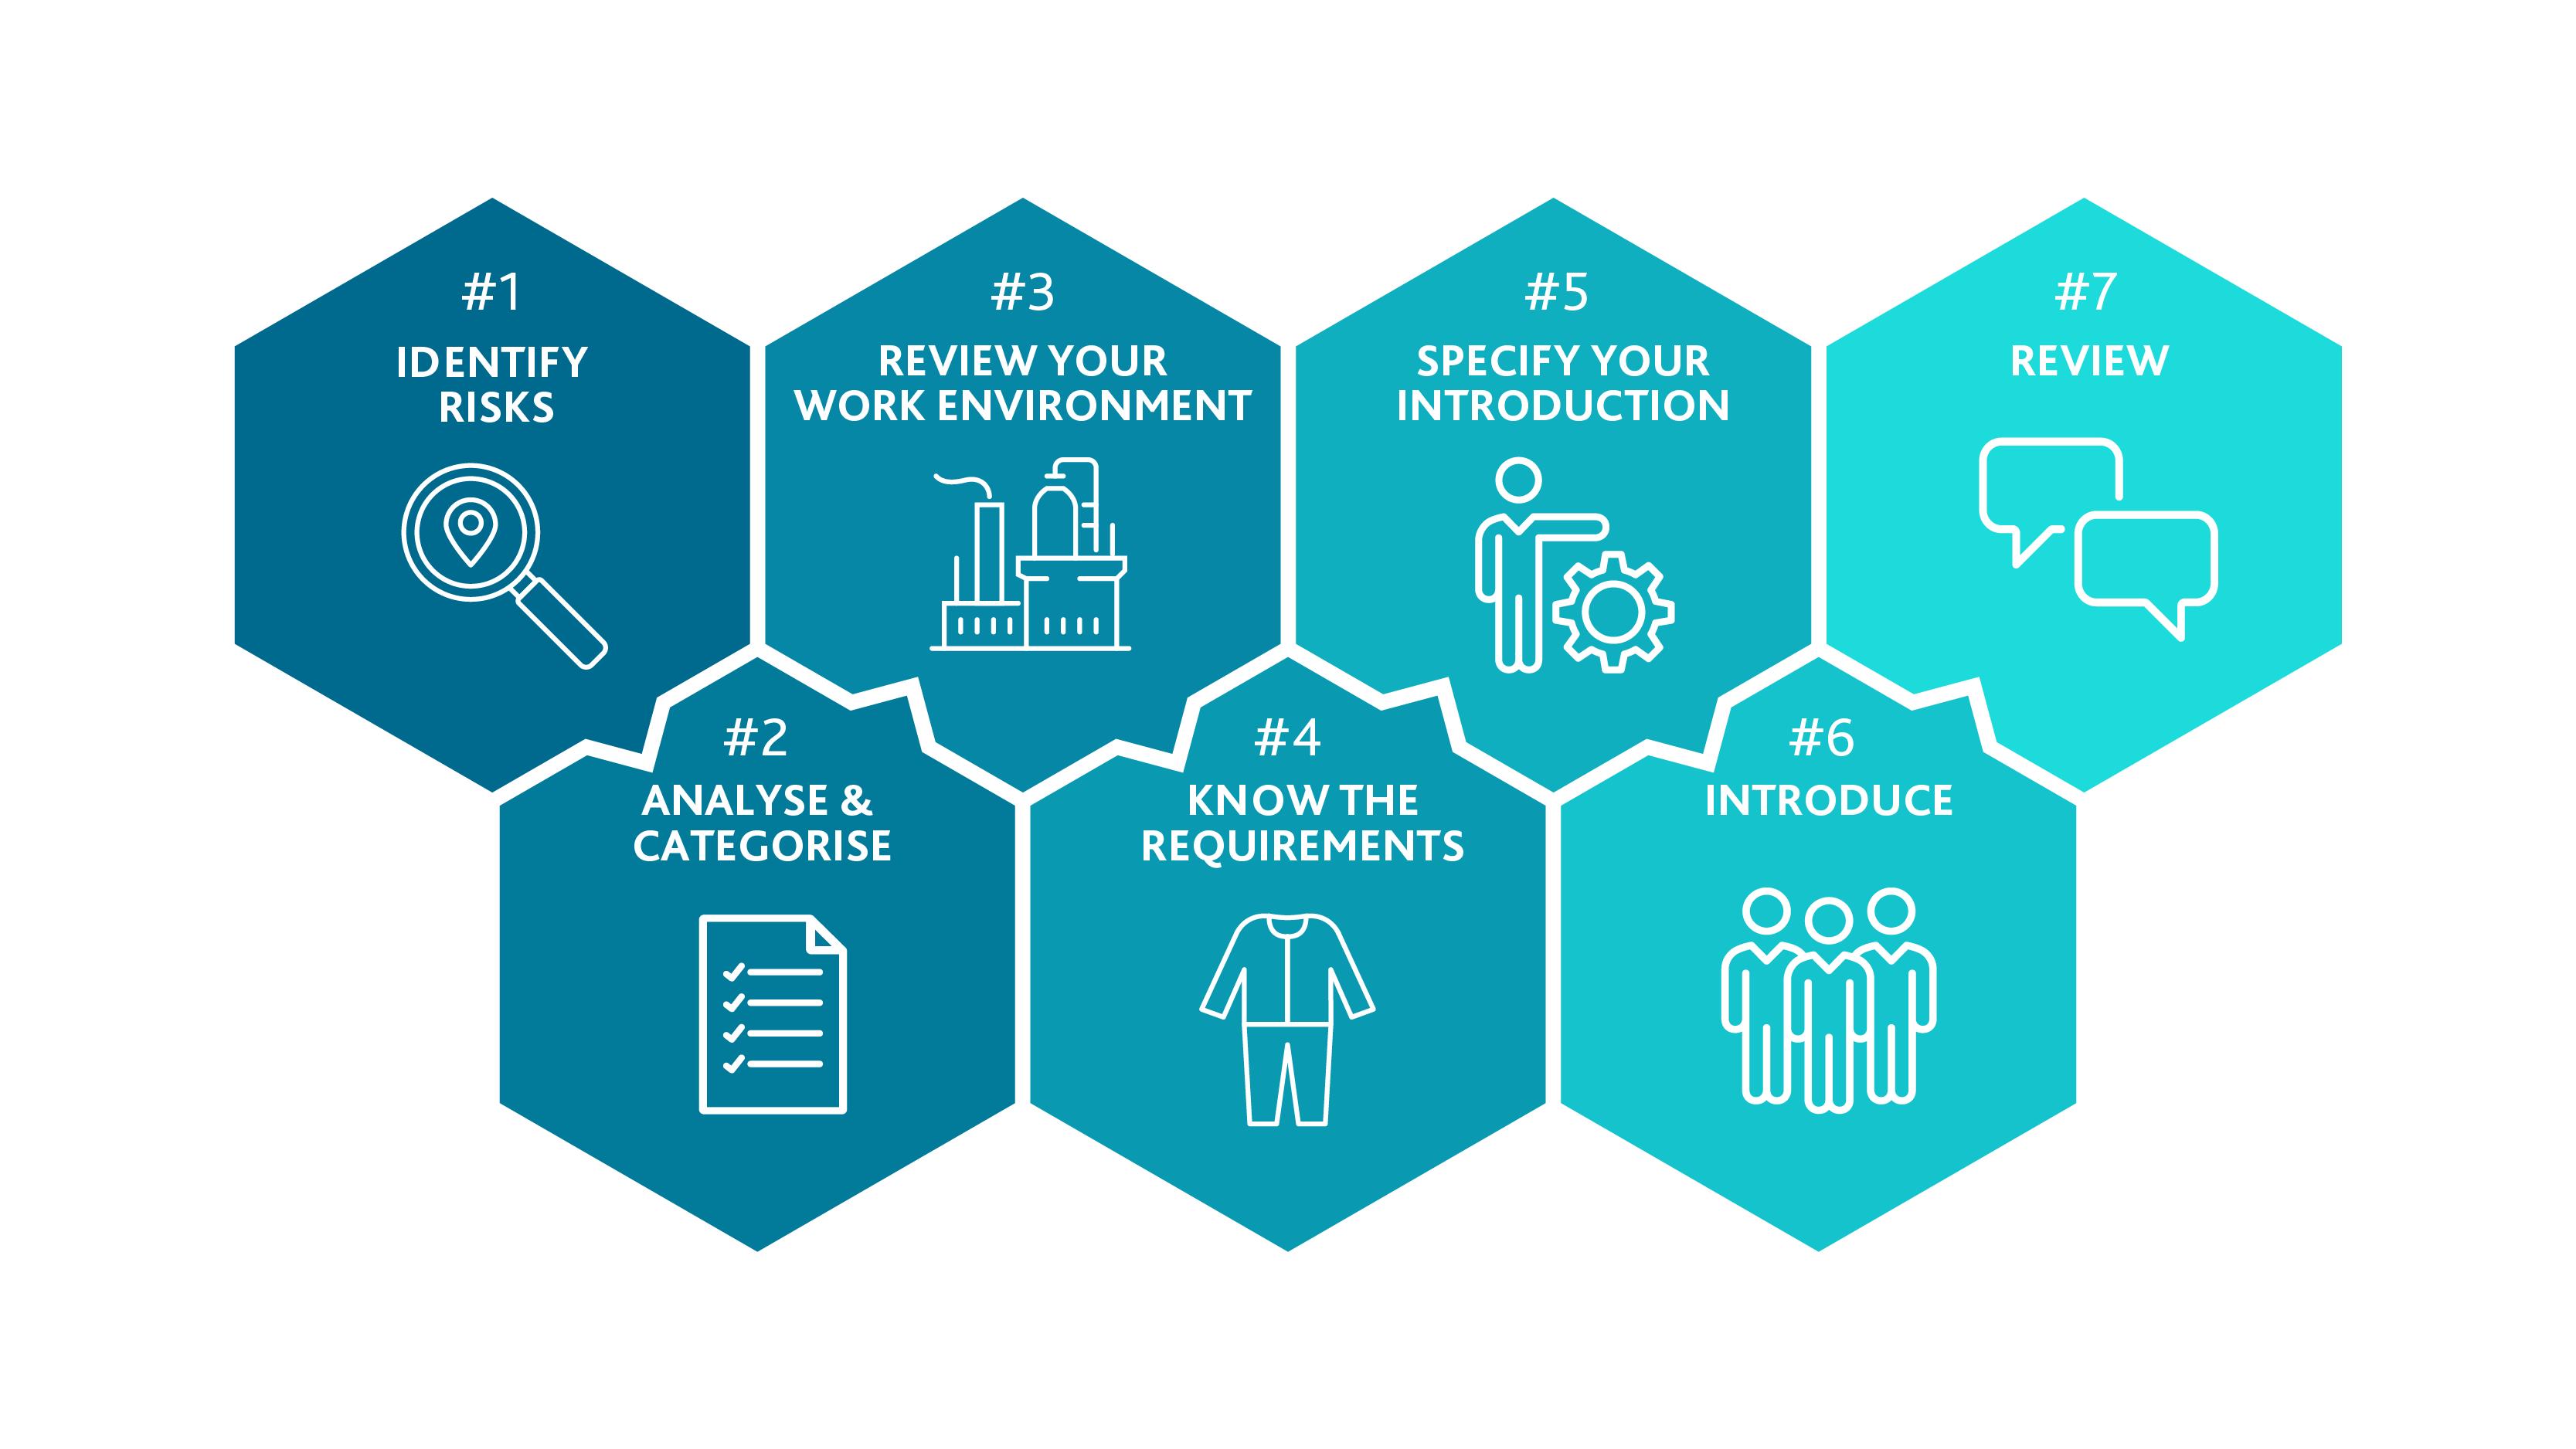 7 steps risk assessment for better safety culture